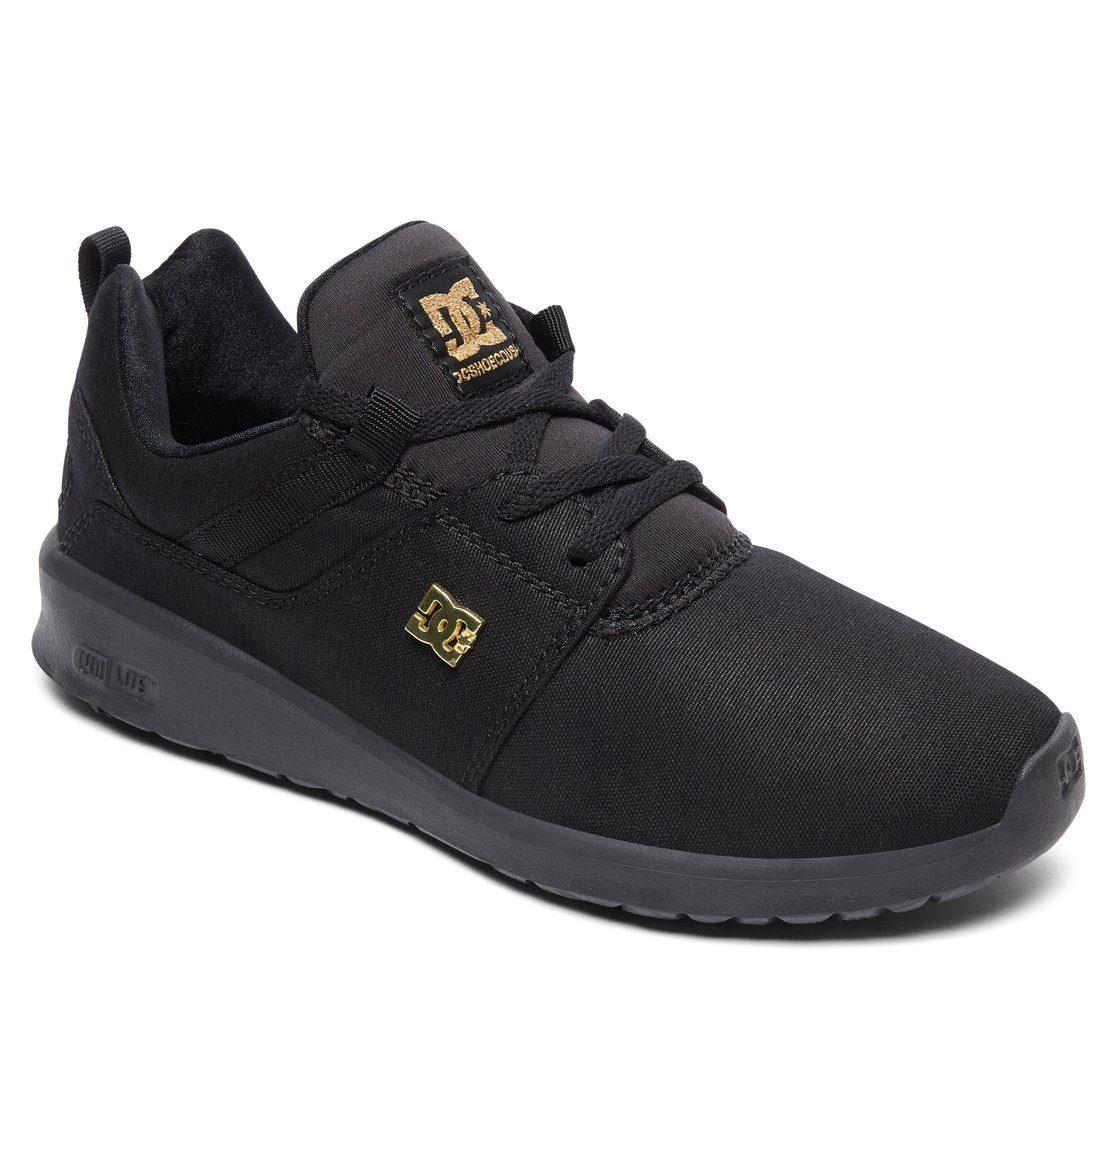 DC Shoes Schuhe Heathrow TX SE online kaufen  Black#ft5_slash#black